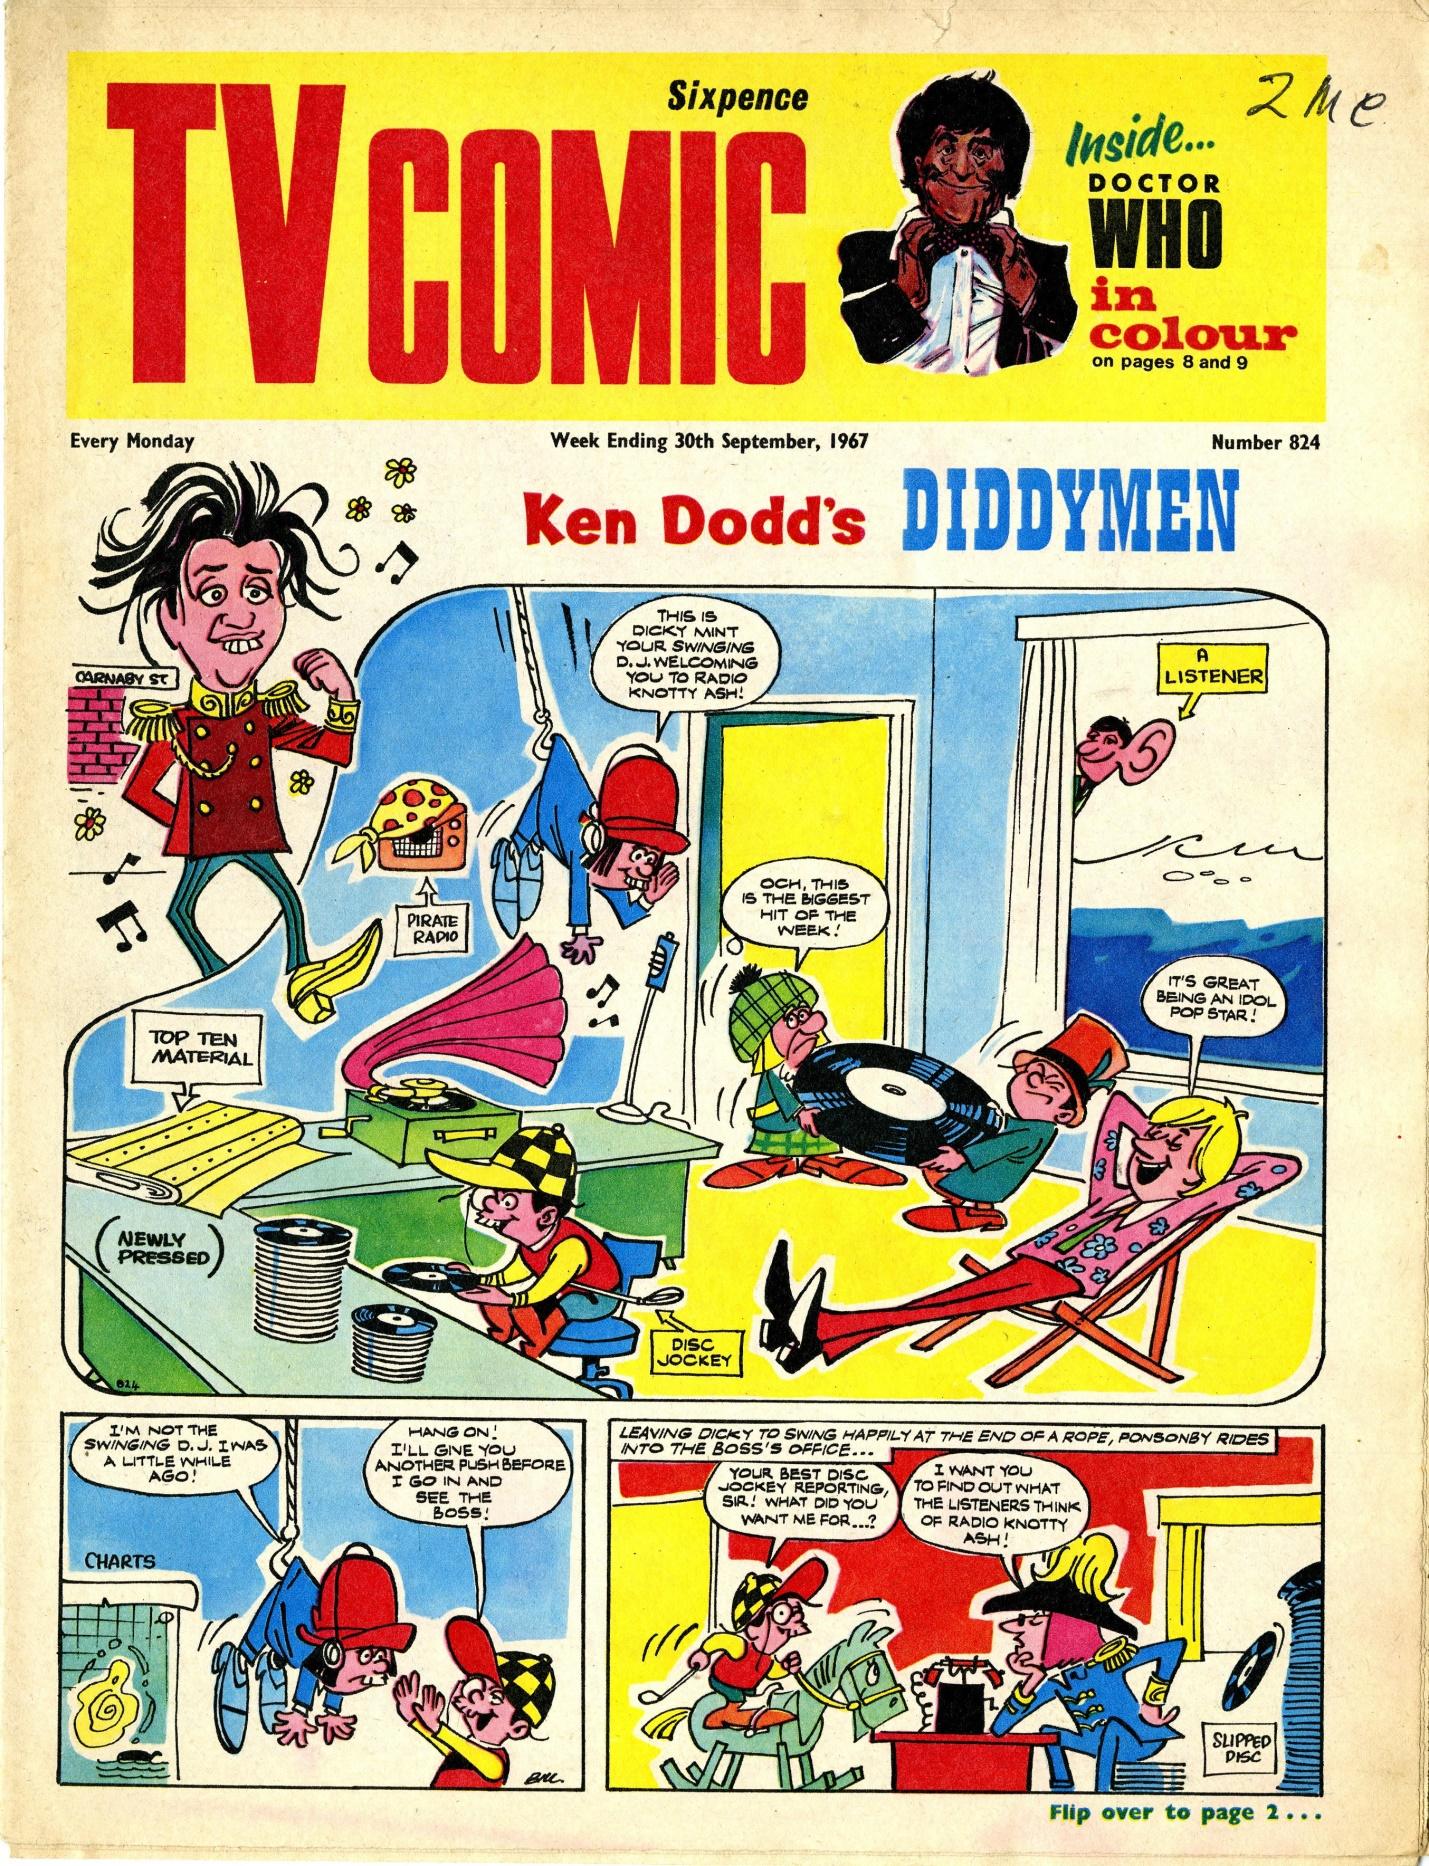 TV Comic number 824, 30 September 1967